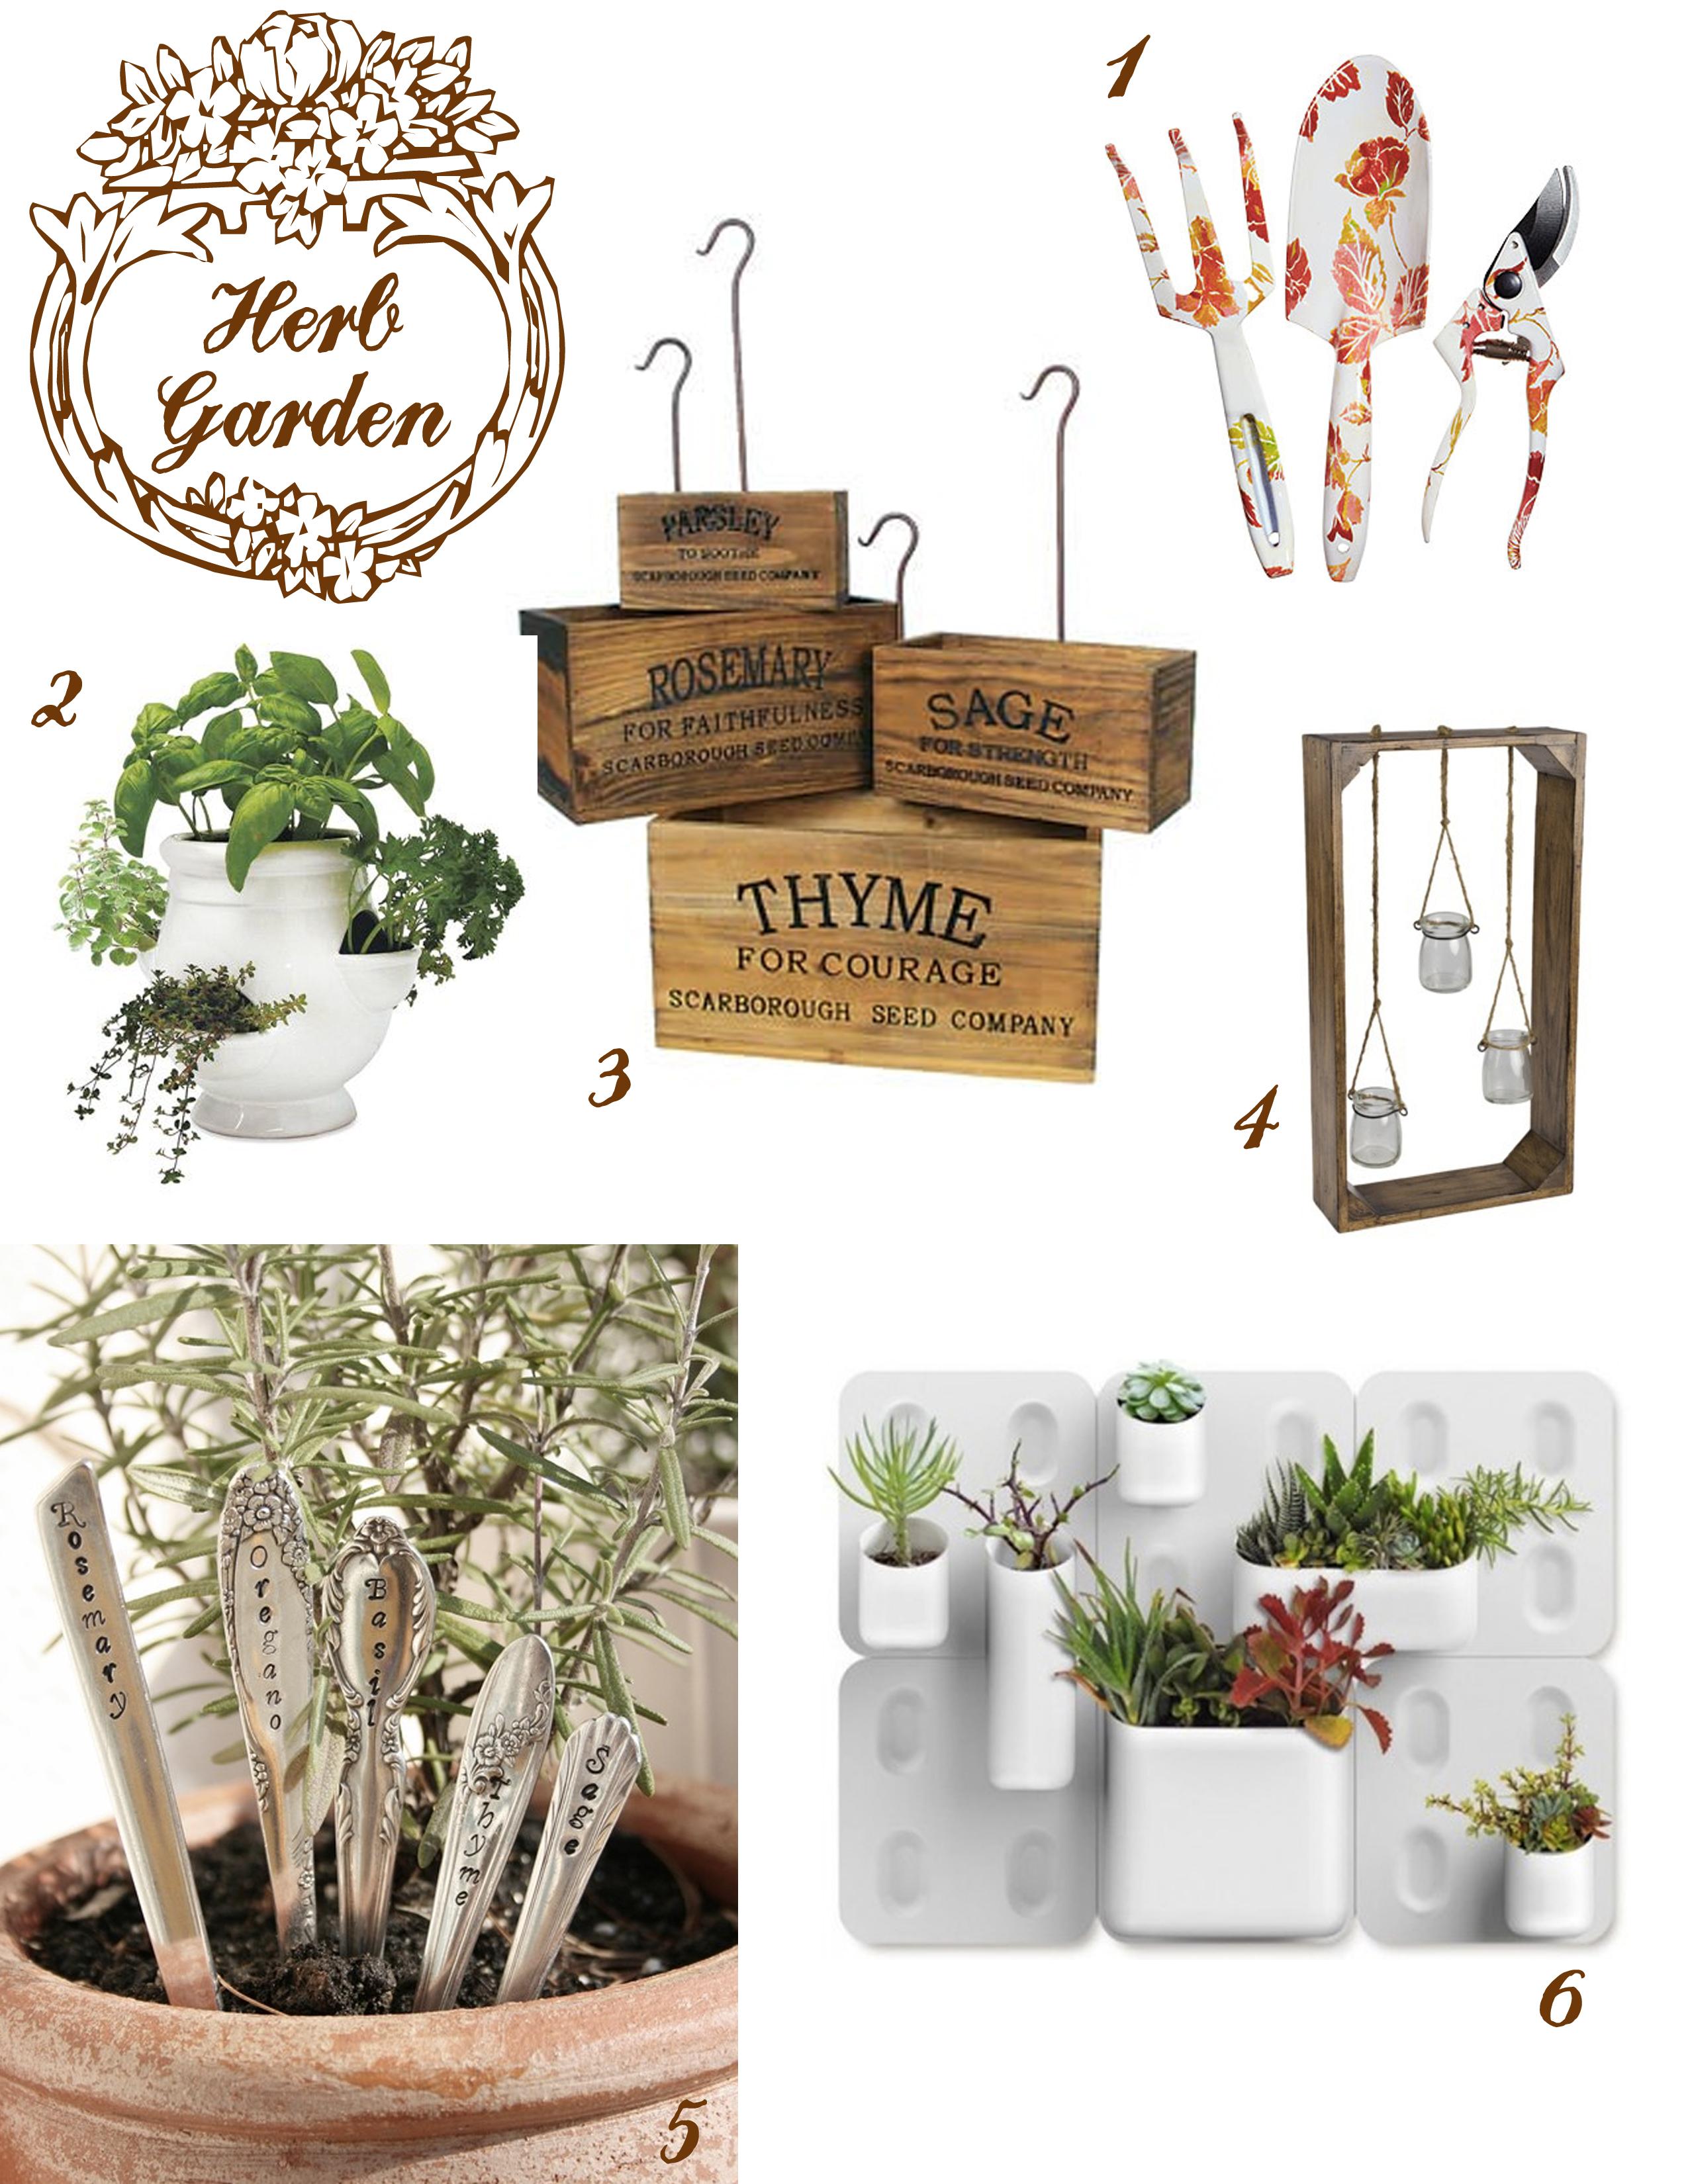 Herb garden ideas bewhatwelove Outdoor herb garden ideas